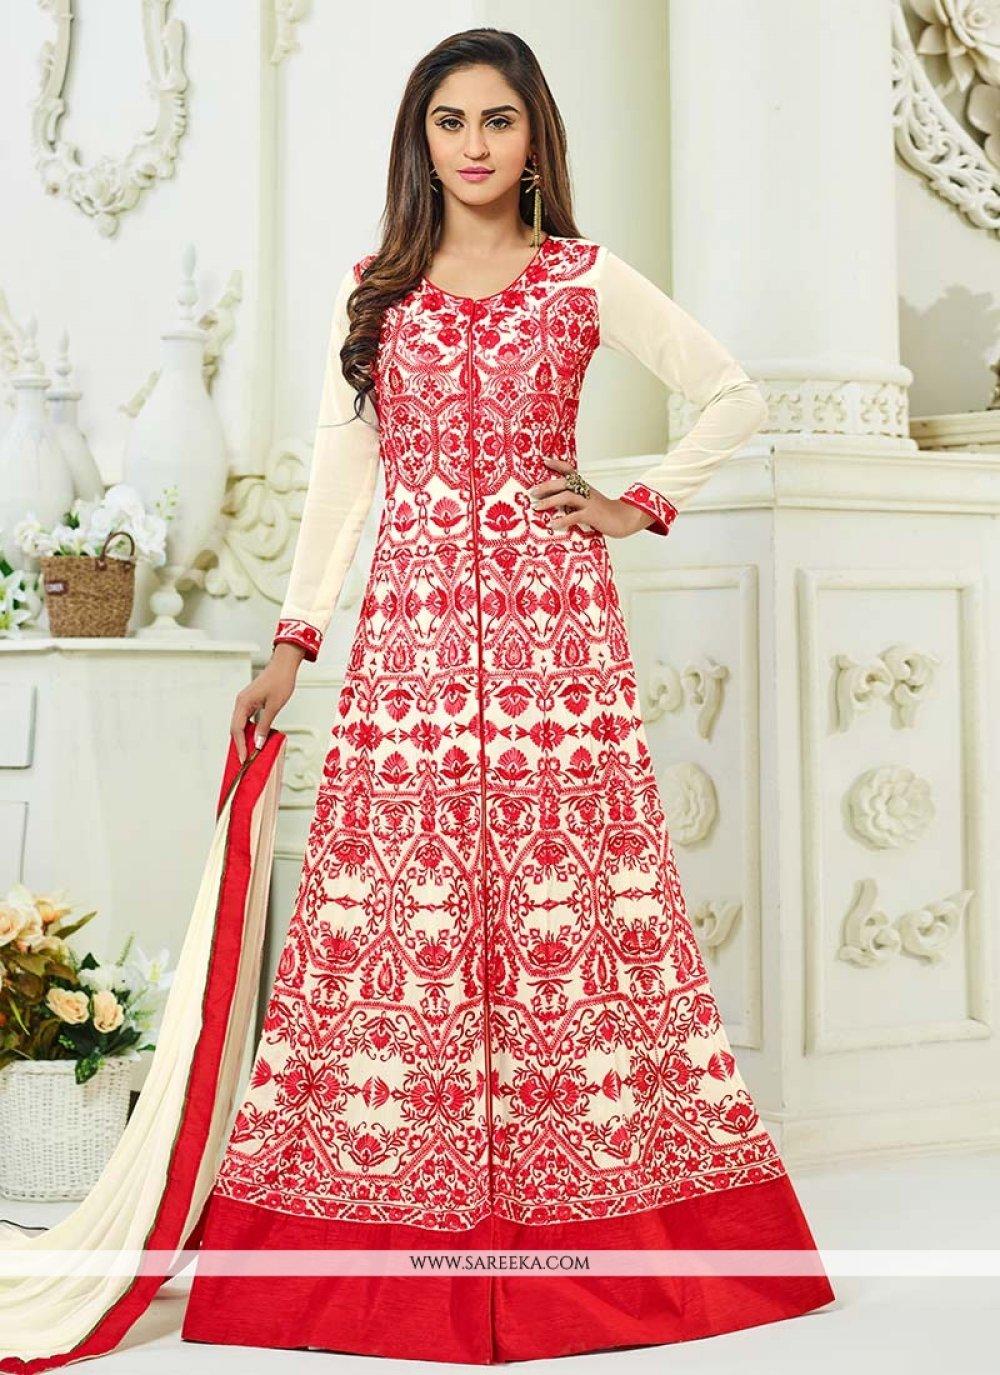 Krystle Dsouza Resham Work Cream and Red Floor Length Anarkali Suit